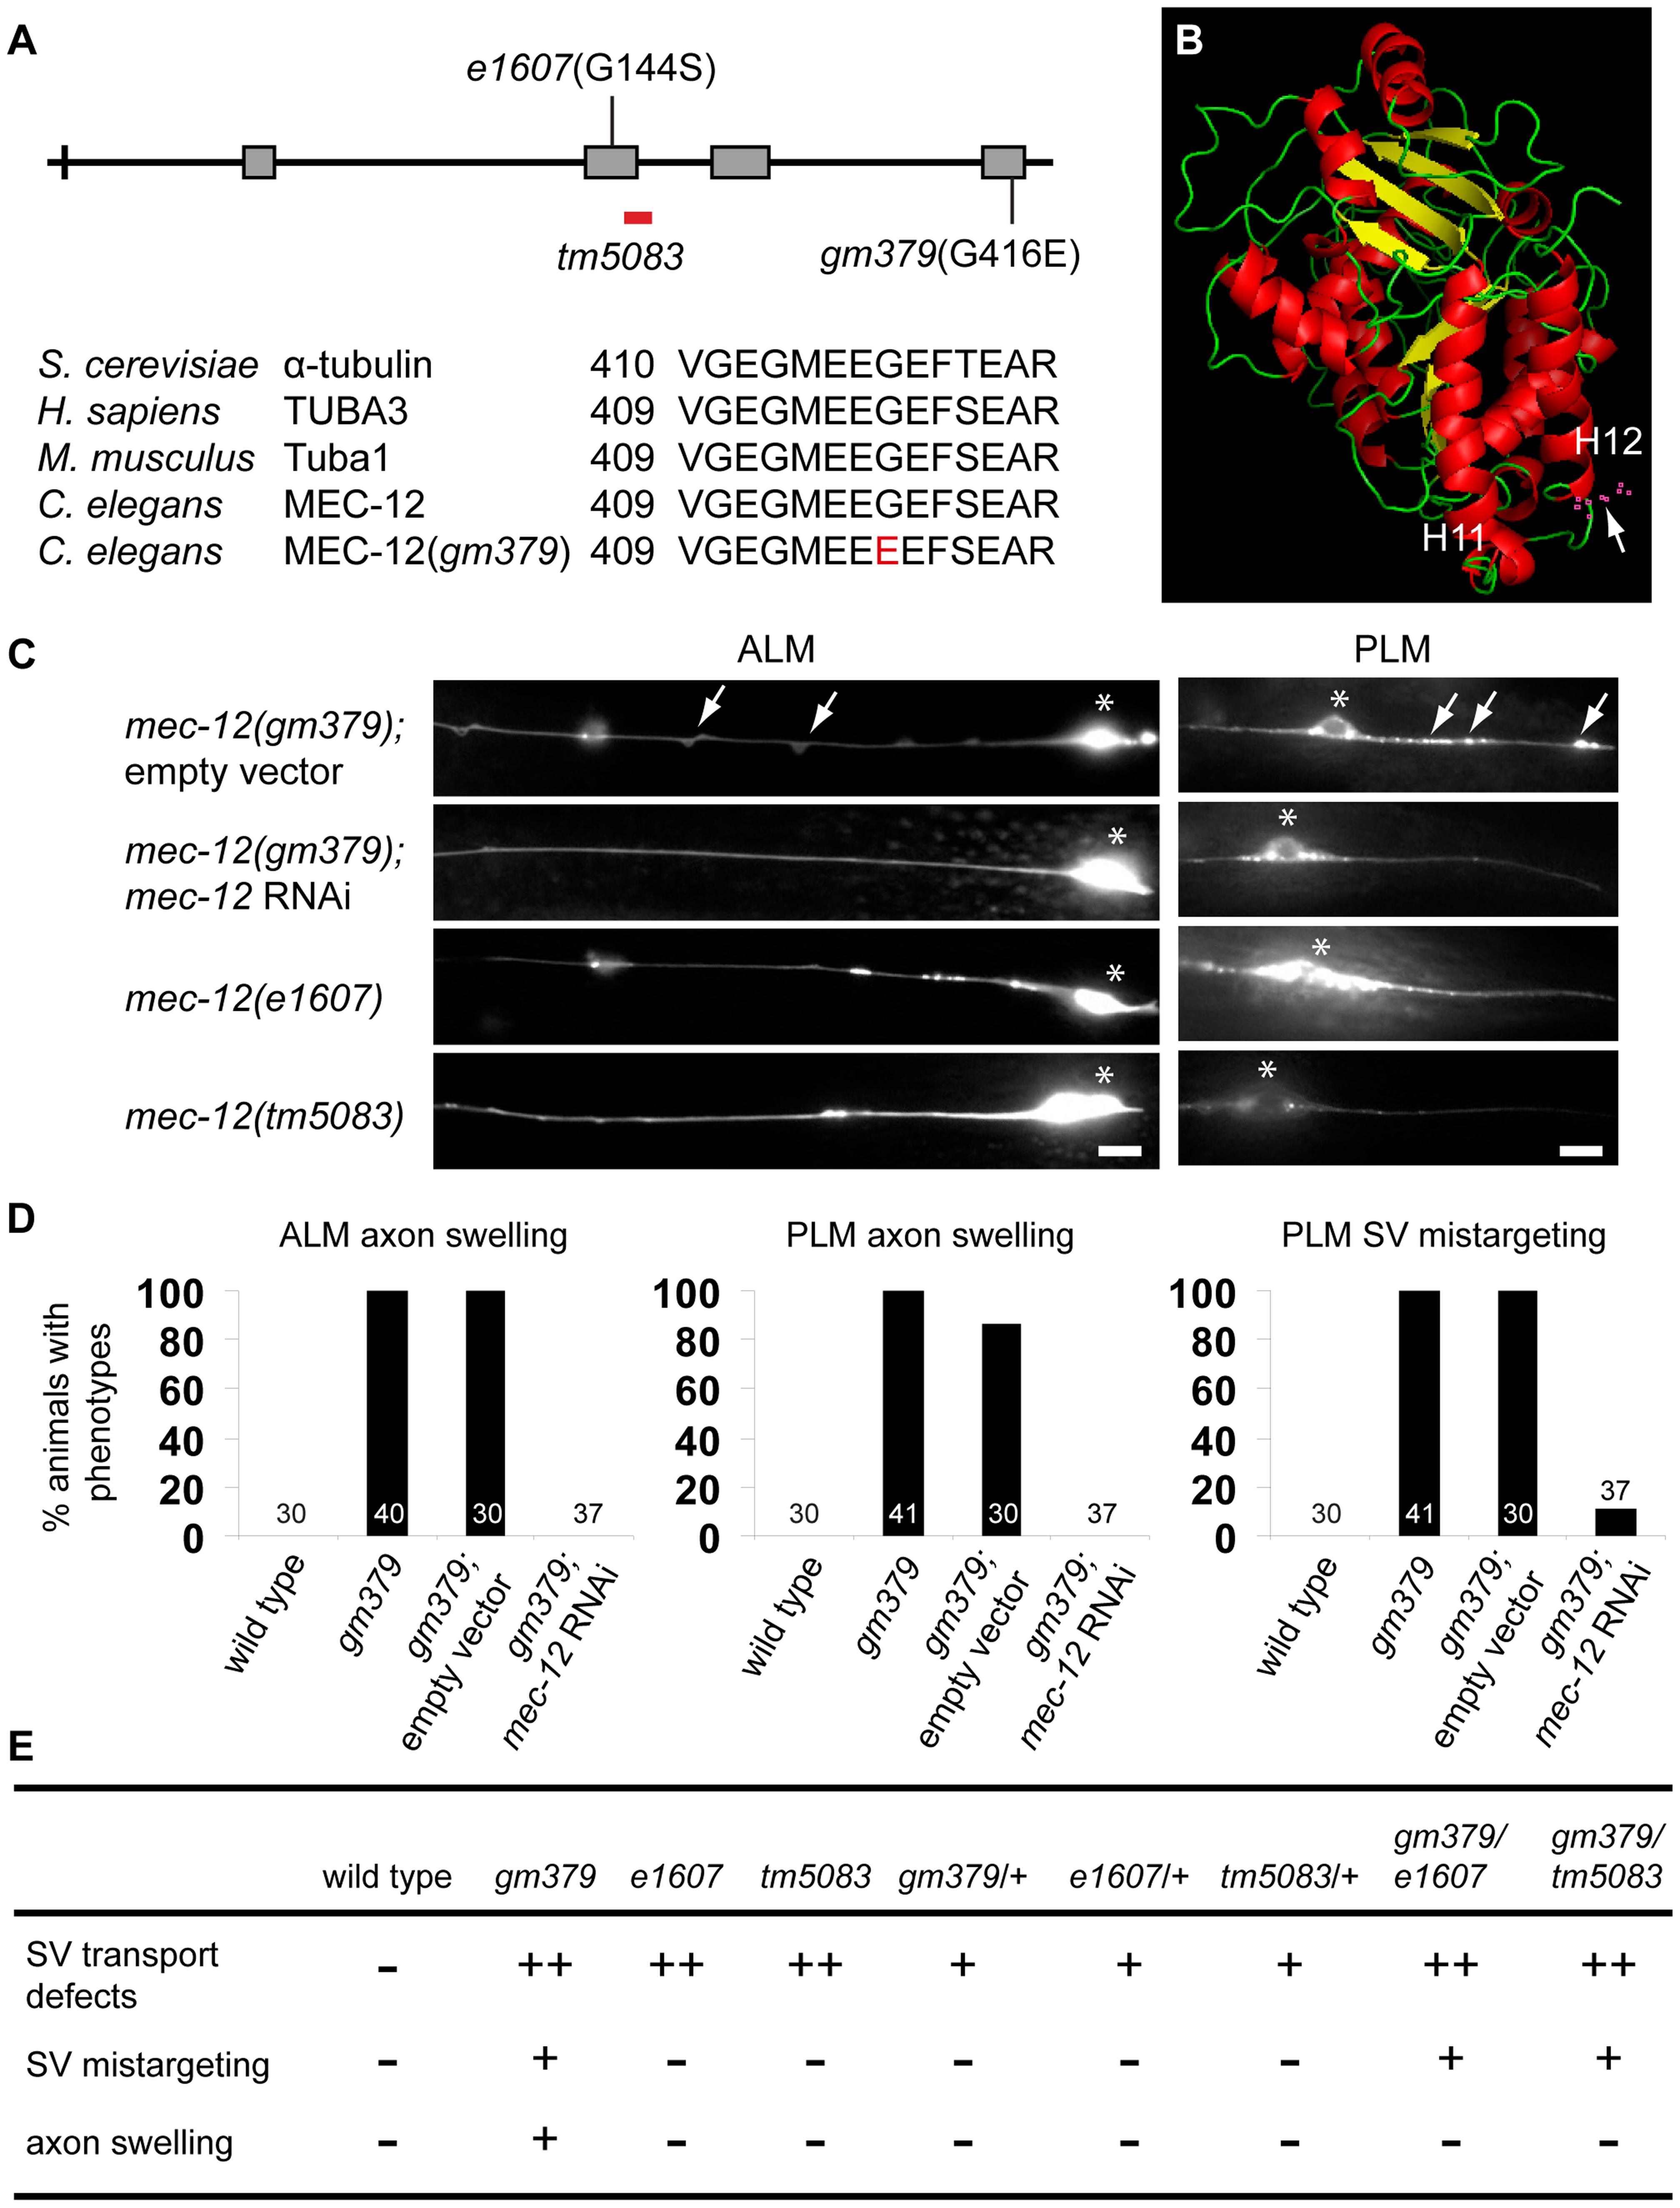 Genetic analysis of <i>gm379</i> and other <i>mec-12</i> alleles.